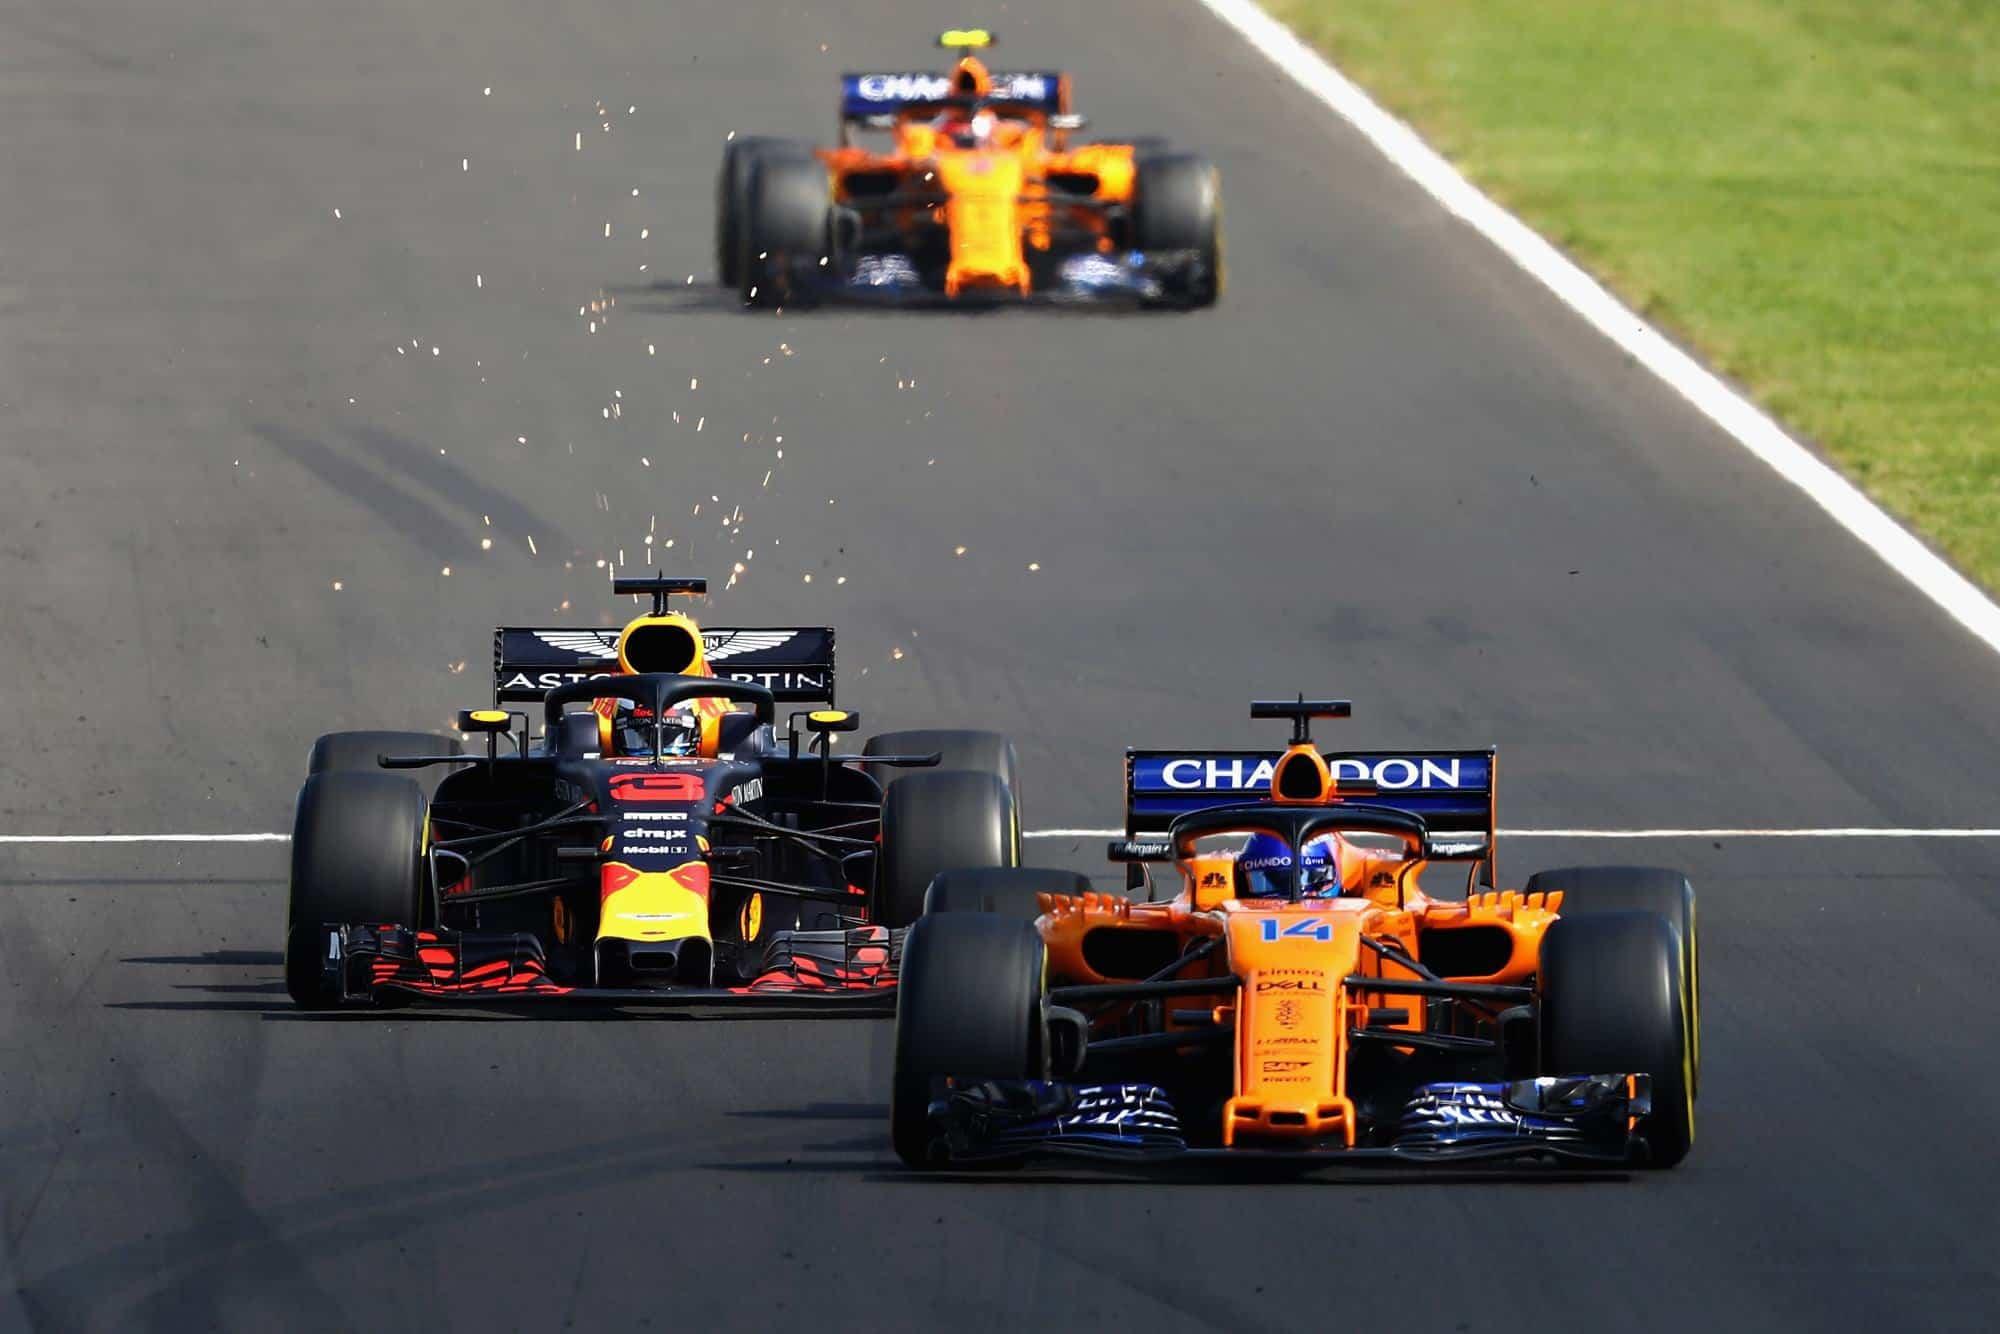 Ricciardo Red Bull battles Alonso McLaren Hungarian GP F1 2018 Photo Red Bull